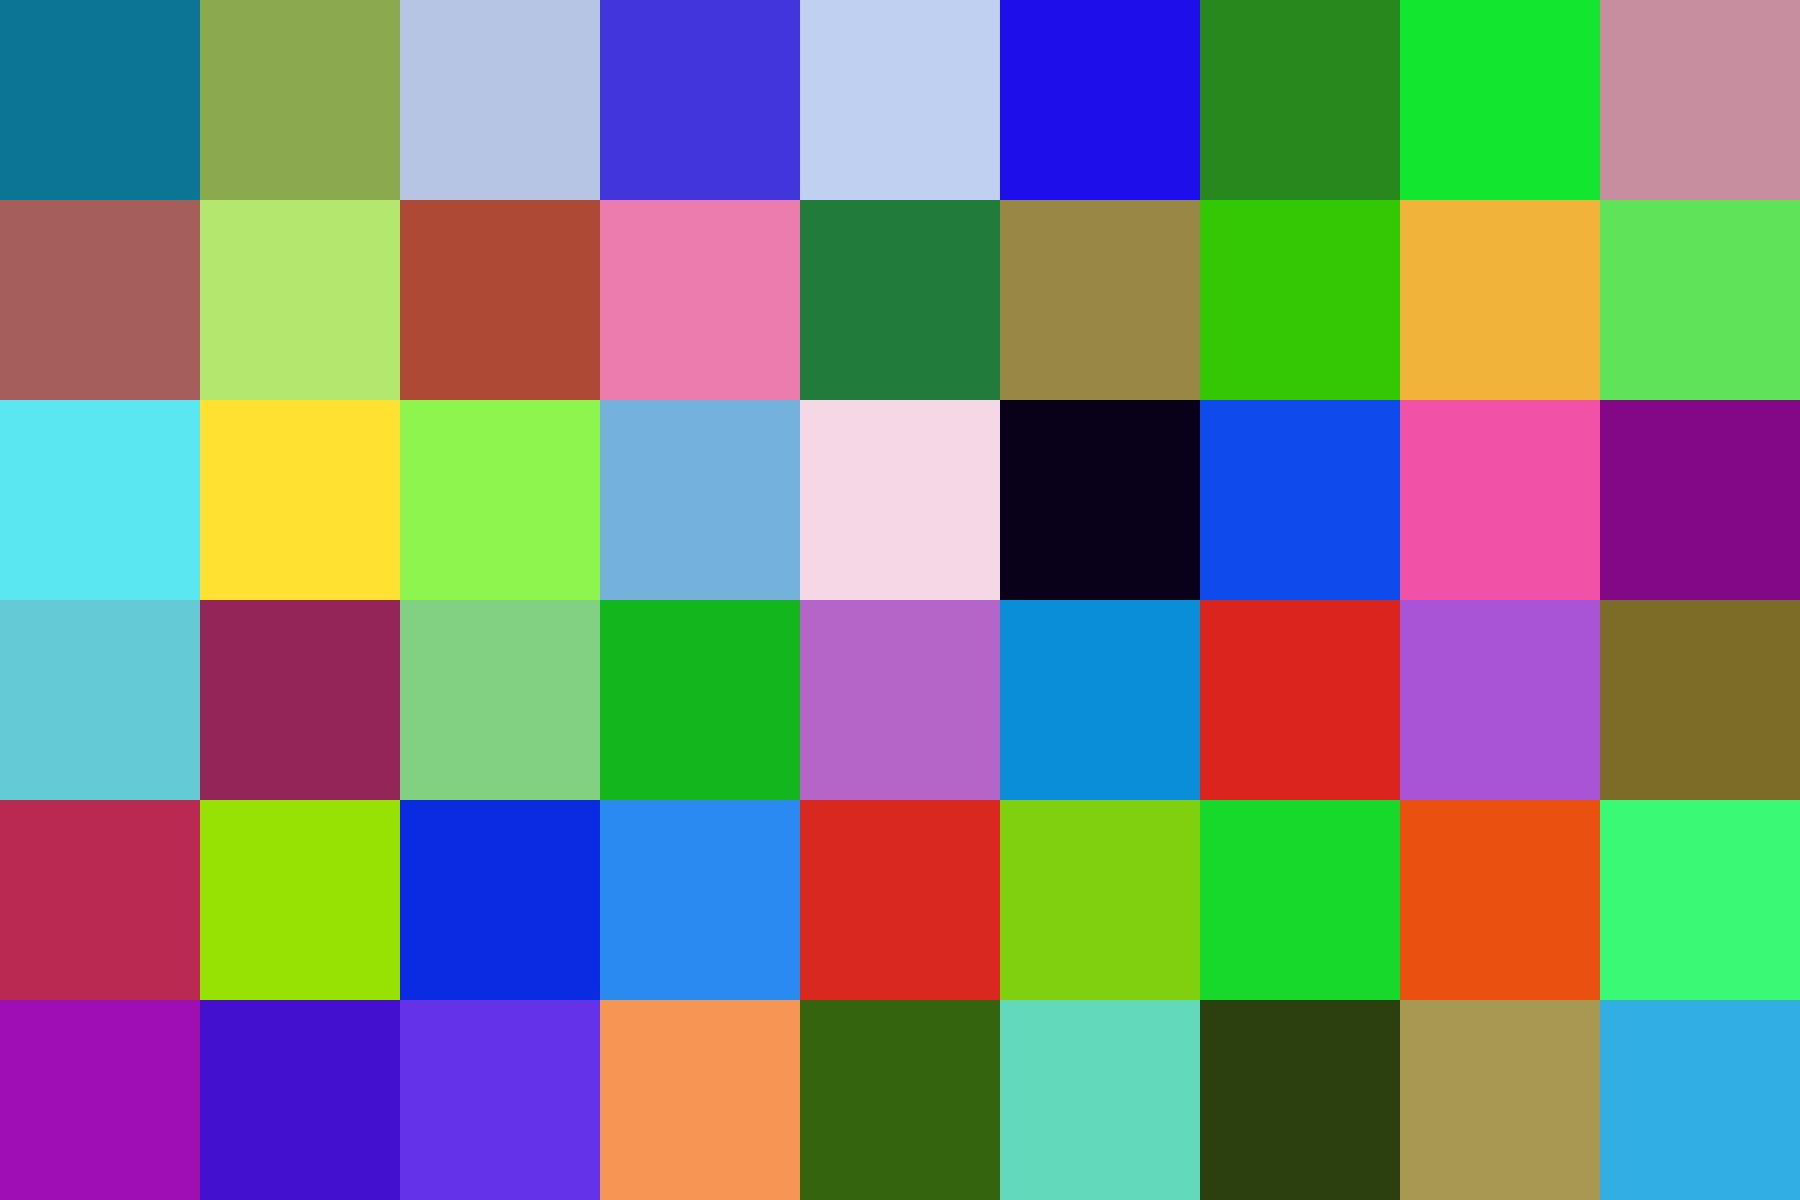 create a random pixel background img online